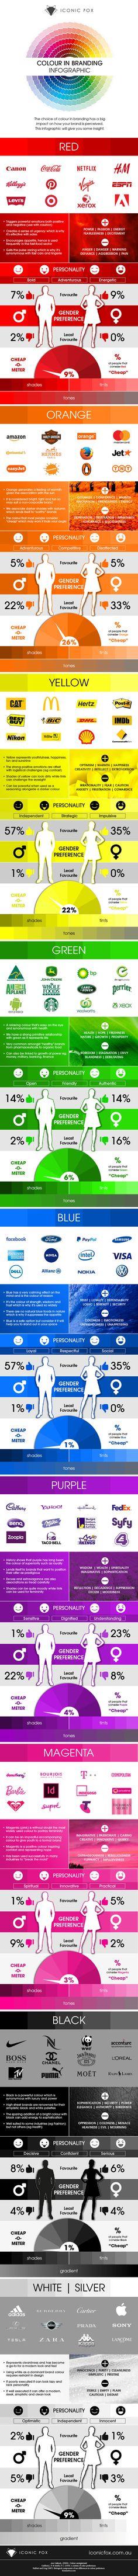 Color & Branding #infografia #infographic #marketing